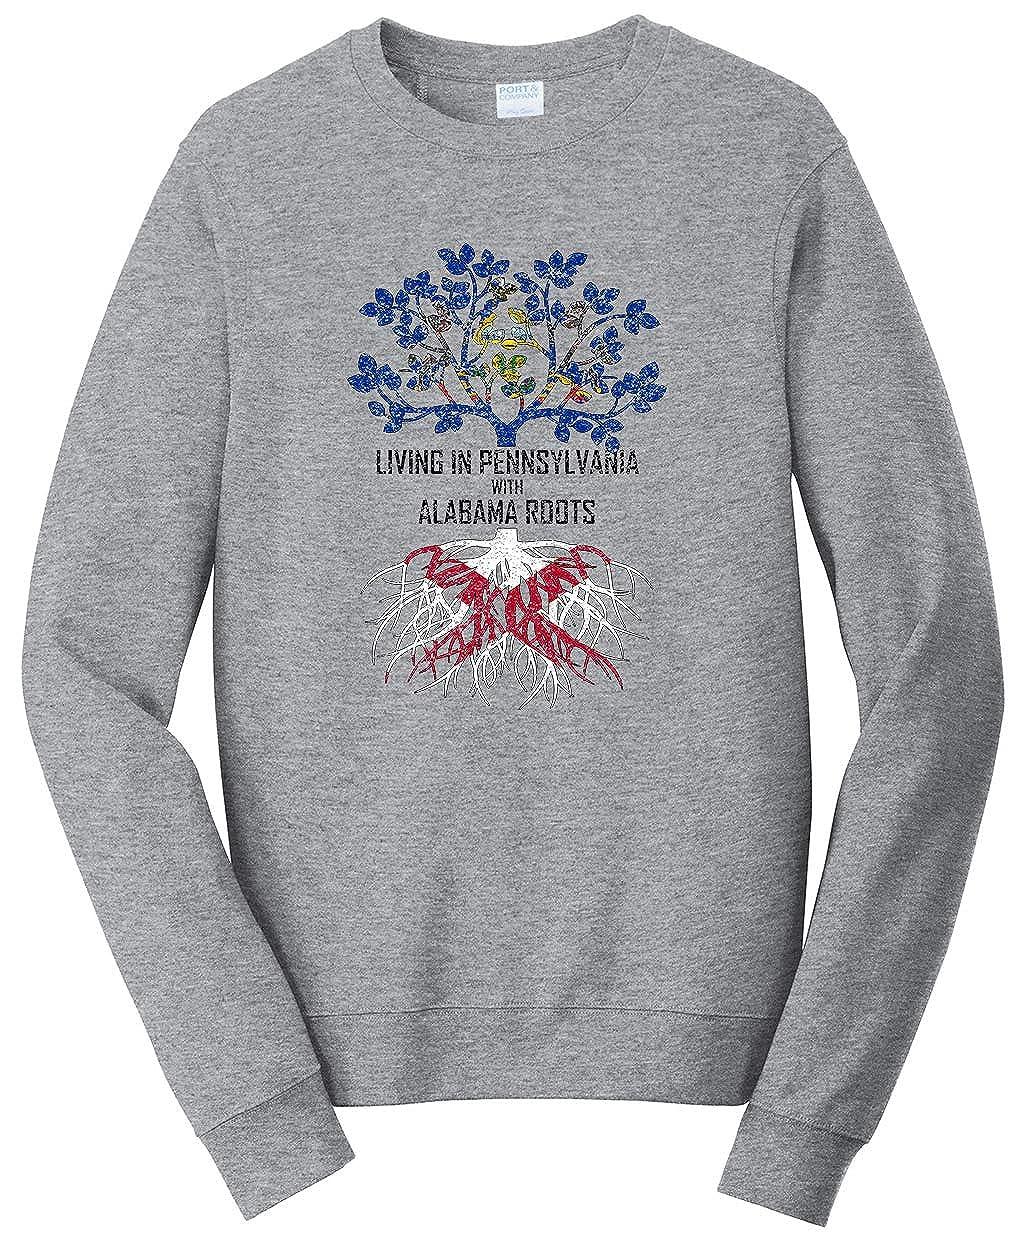 Tenacitee Unisex Living in Pennsylvania Alabama Roots Sweatshirt